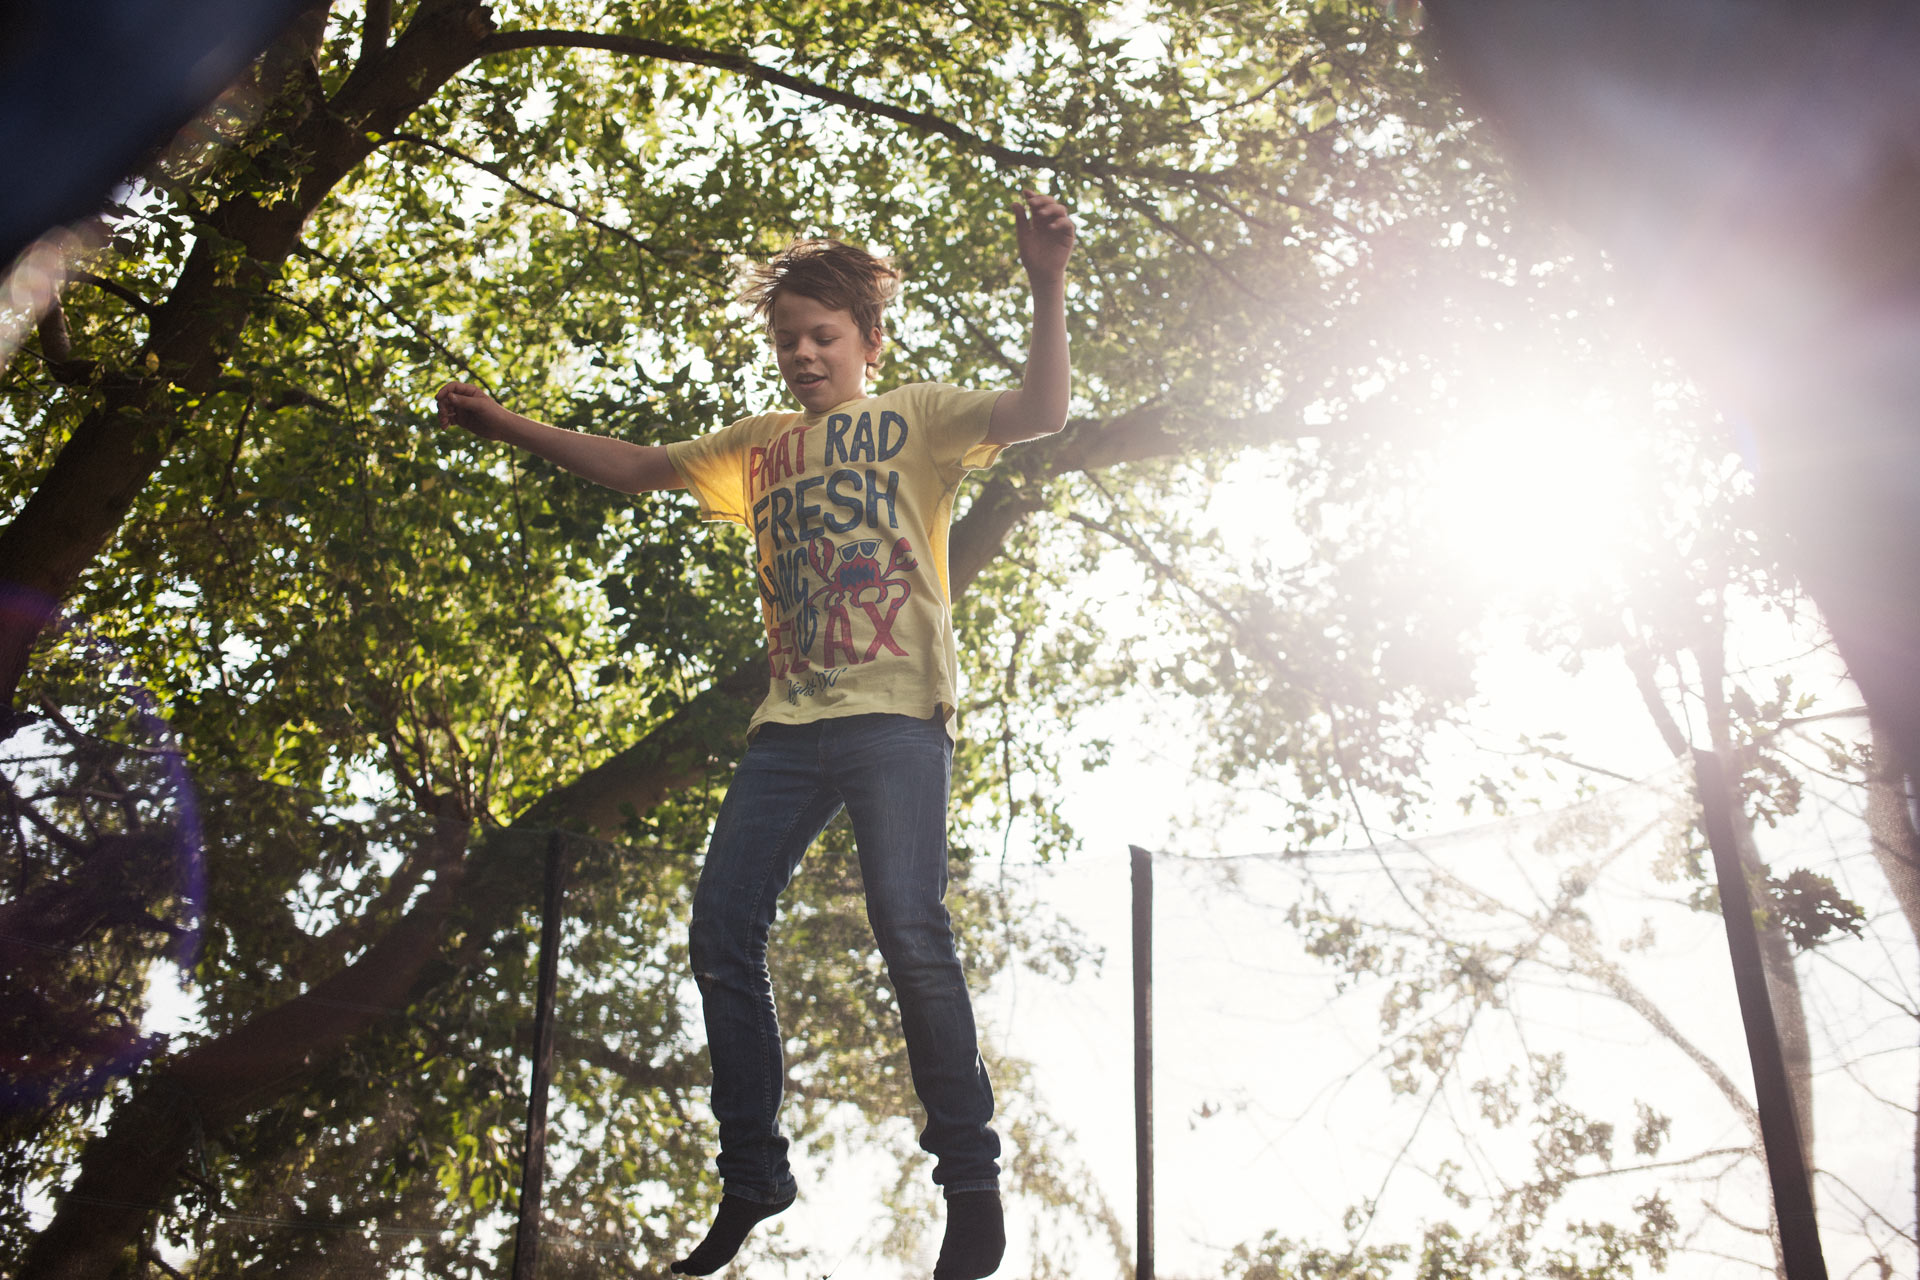 timo-stammberger-photography-fotografie-boy-sunny-trampoline-moment-backyard-happy